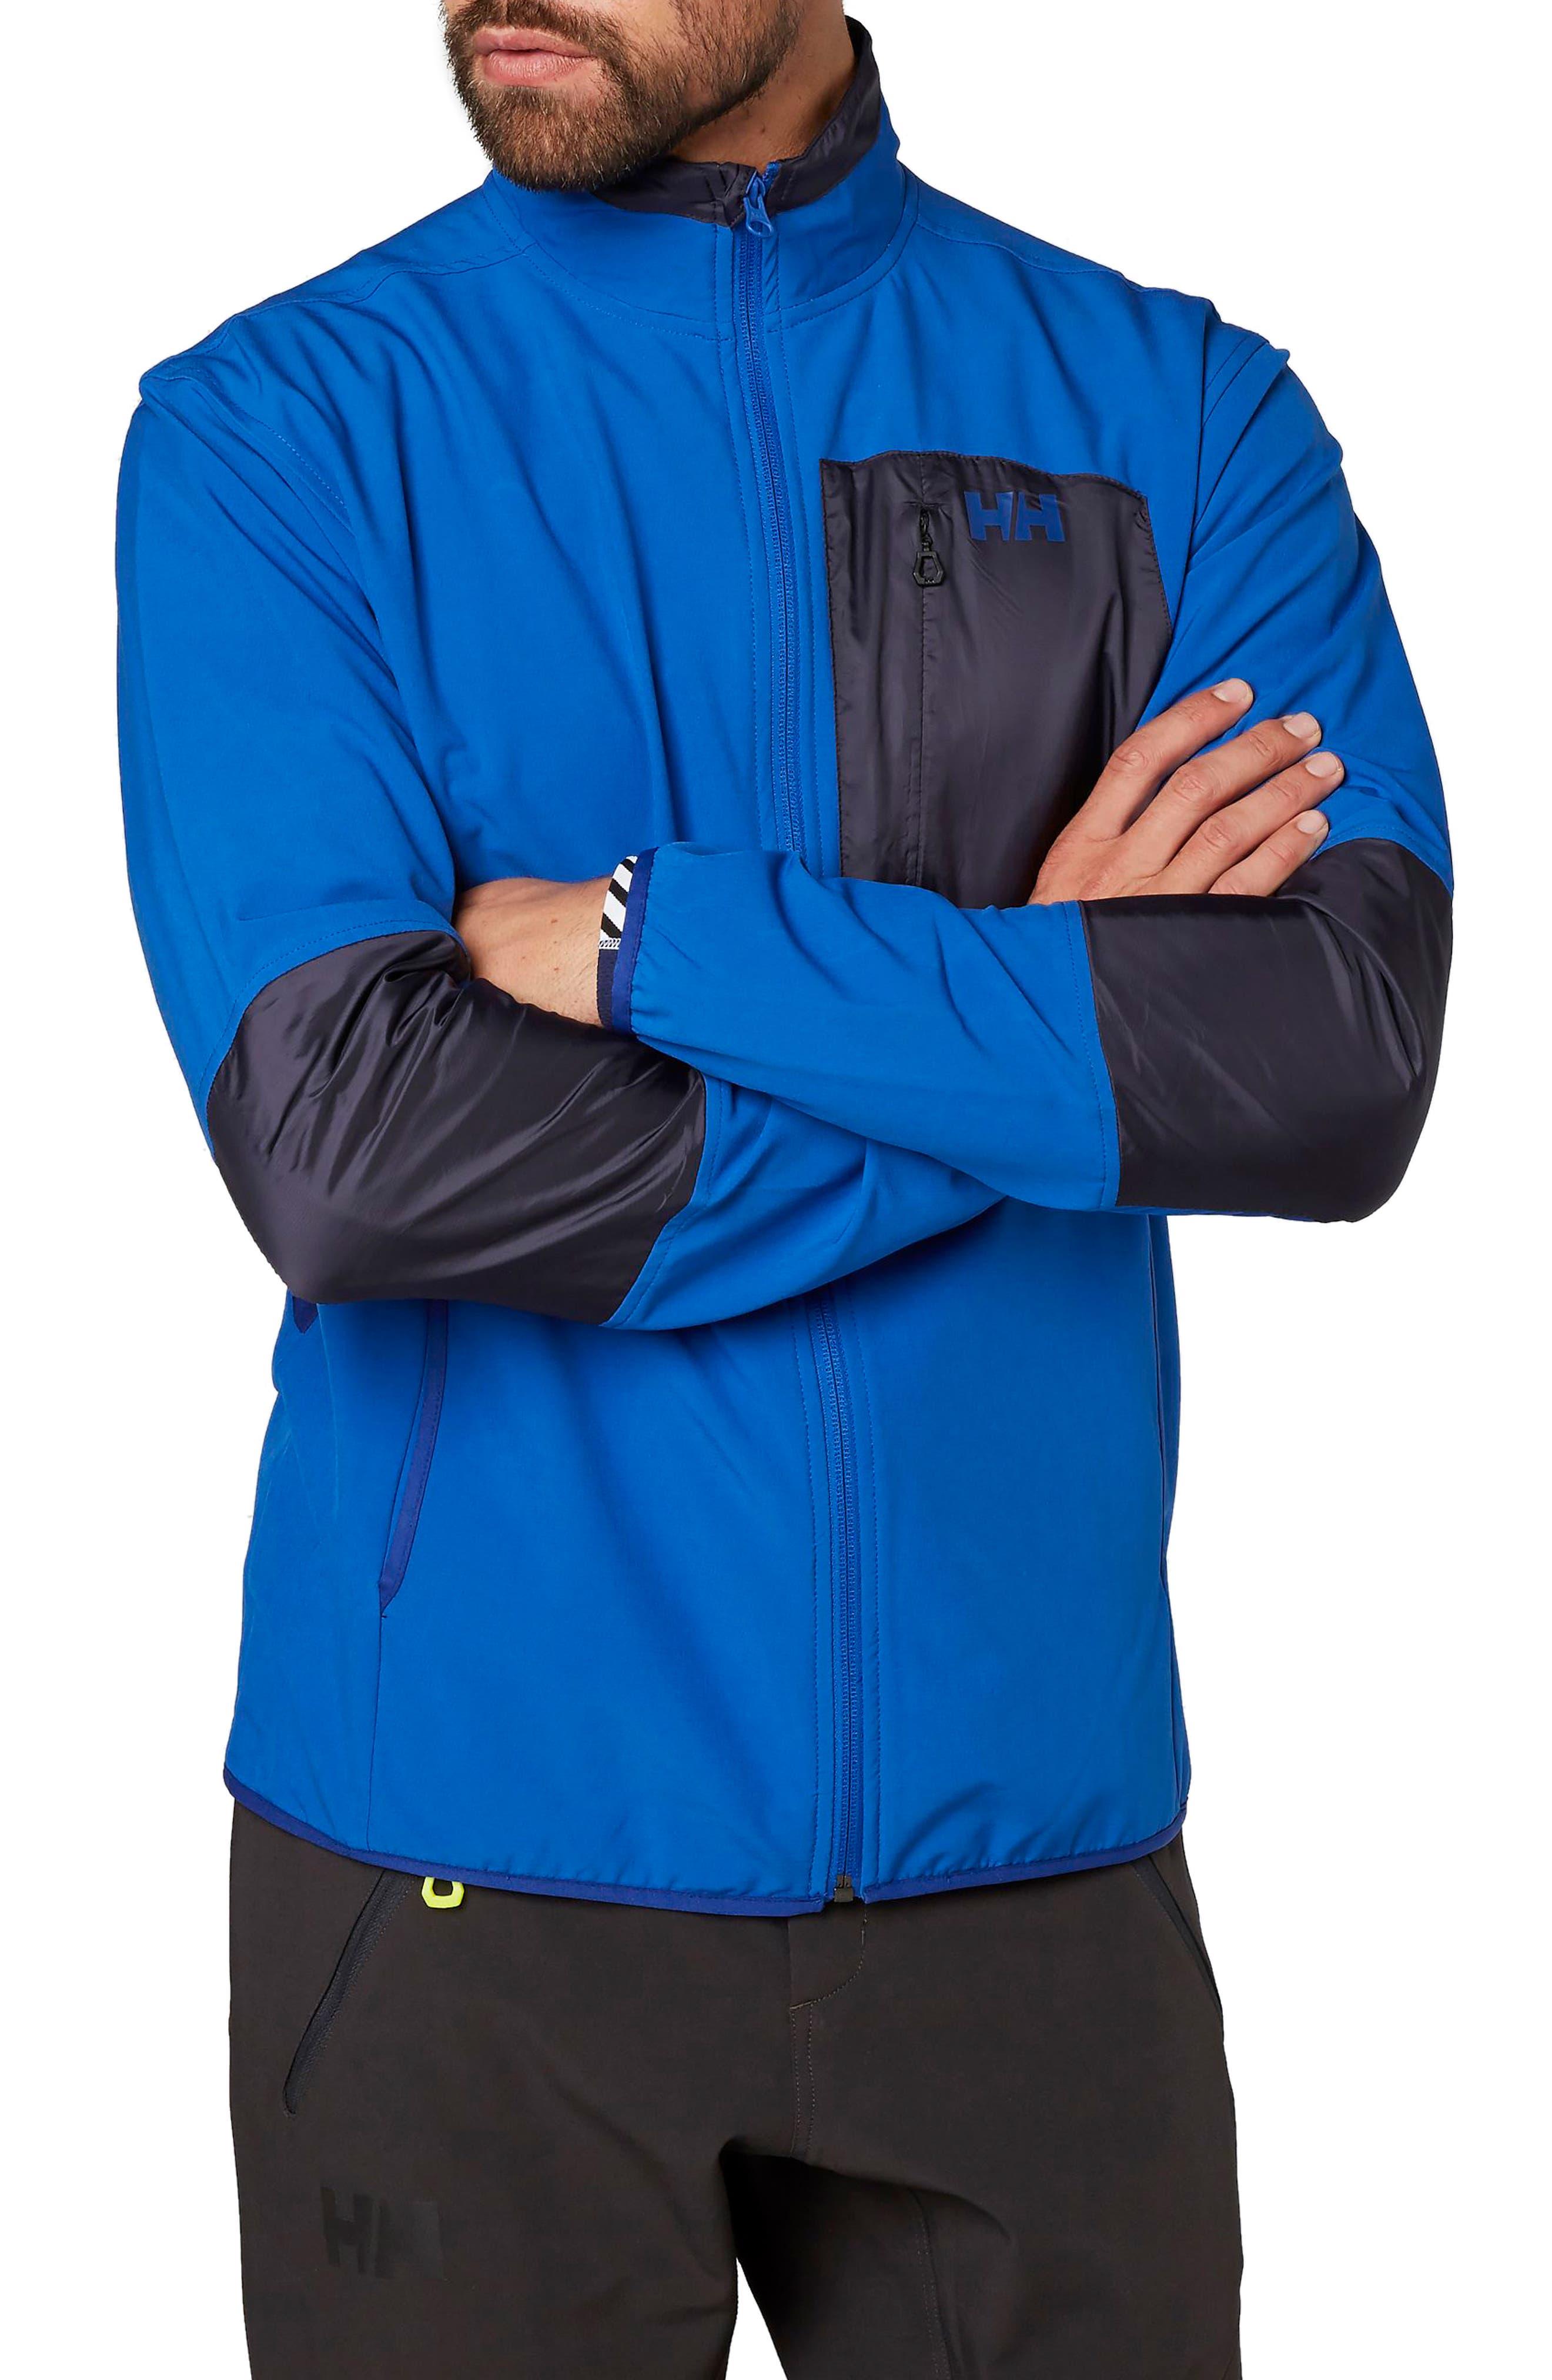 Wynn Rask Soft Shell Jacket,                             Main thumbnail 1, color,                             Olympian Blue